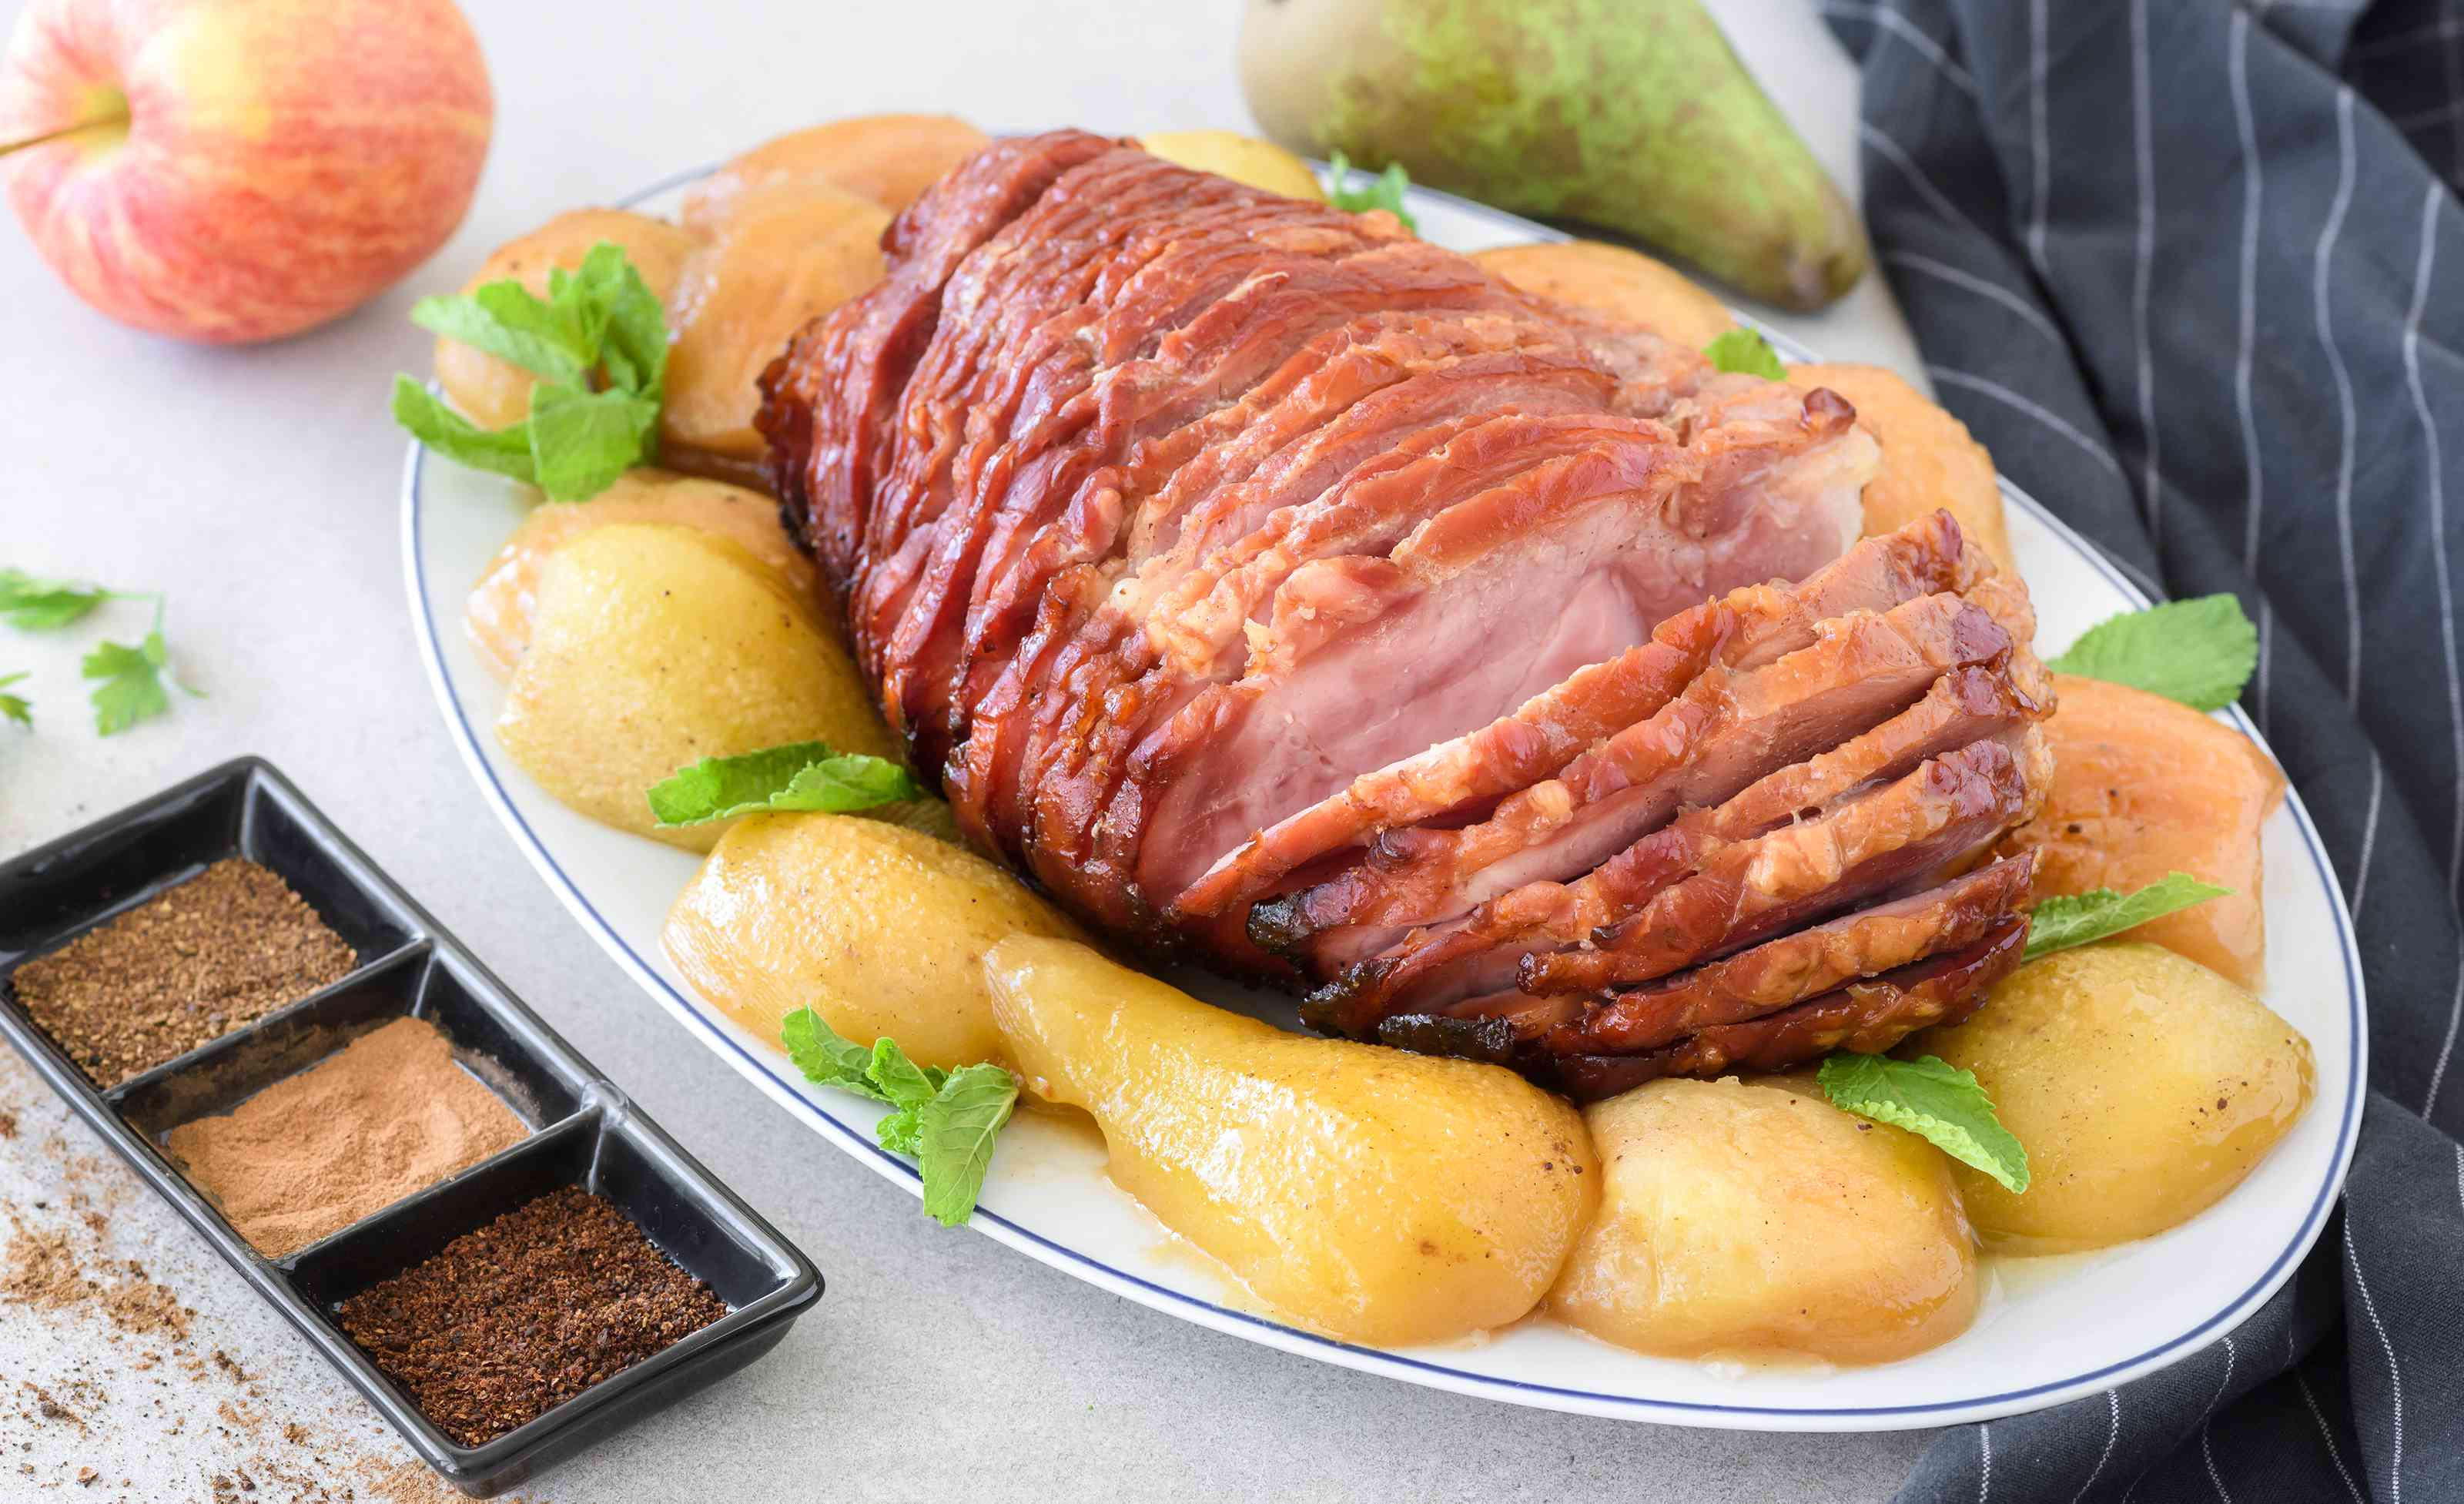 Baked ham slices recipe